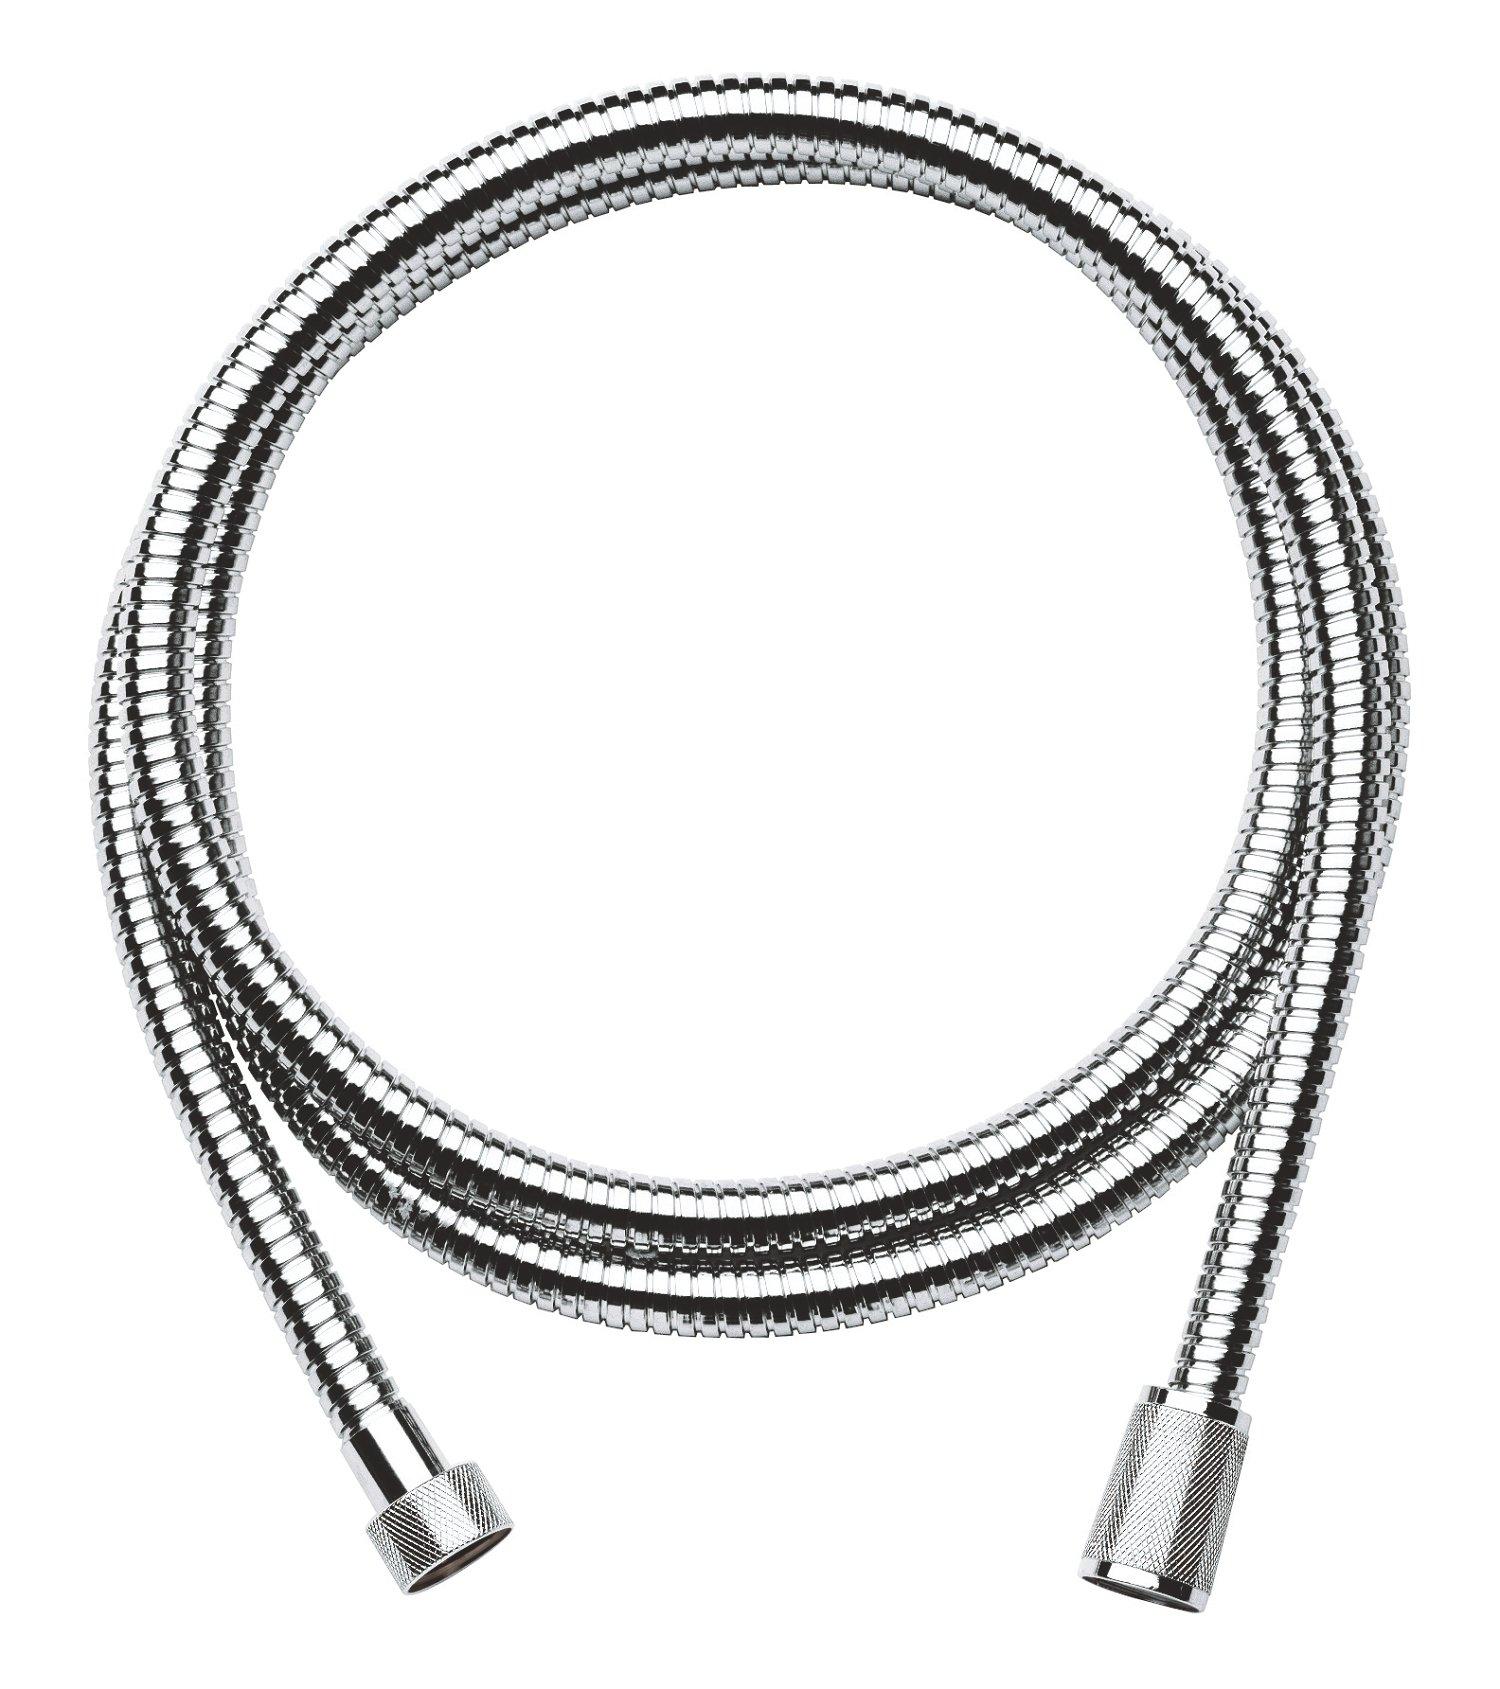 Relexa Longlife Metallic Hose